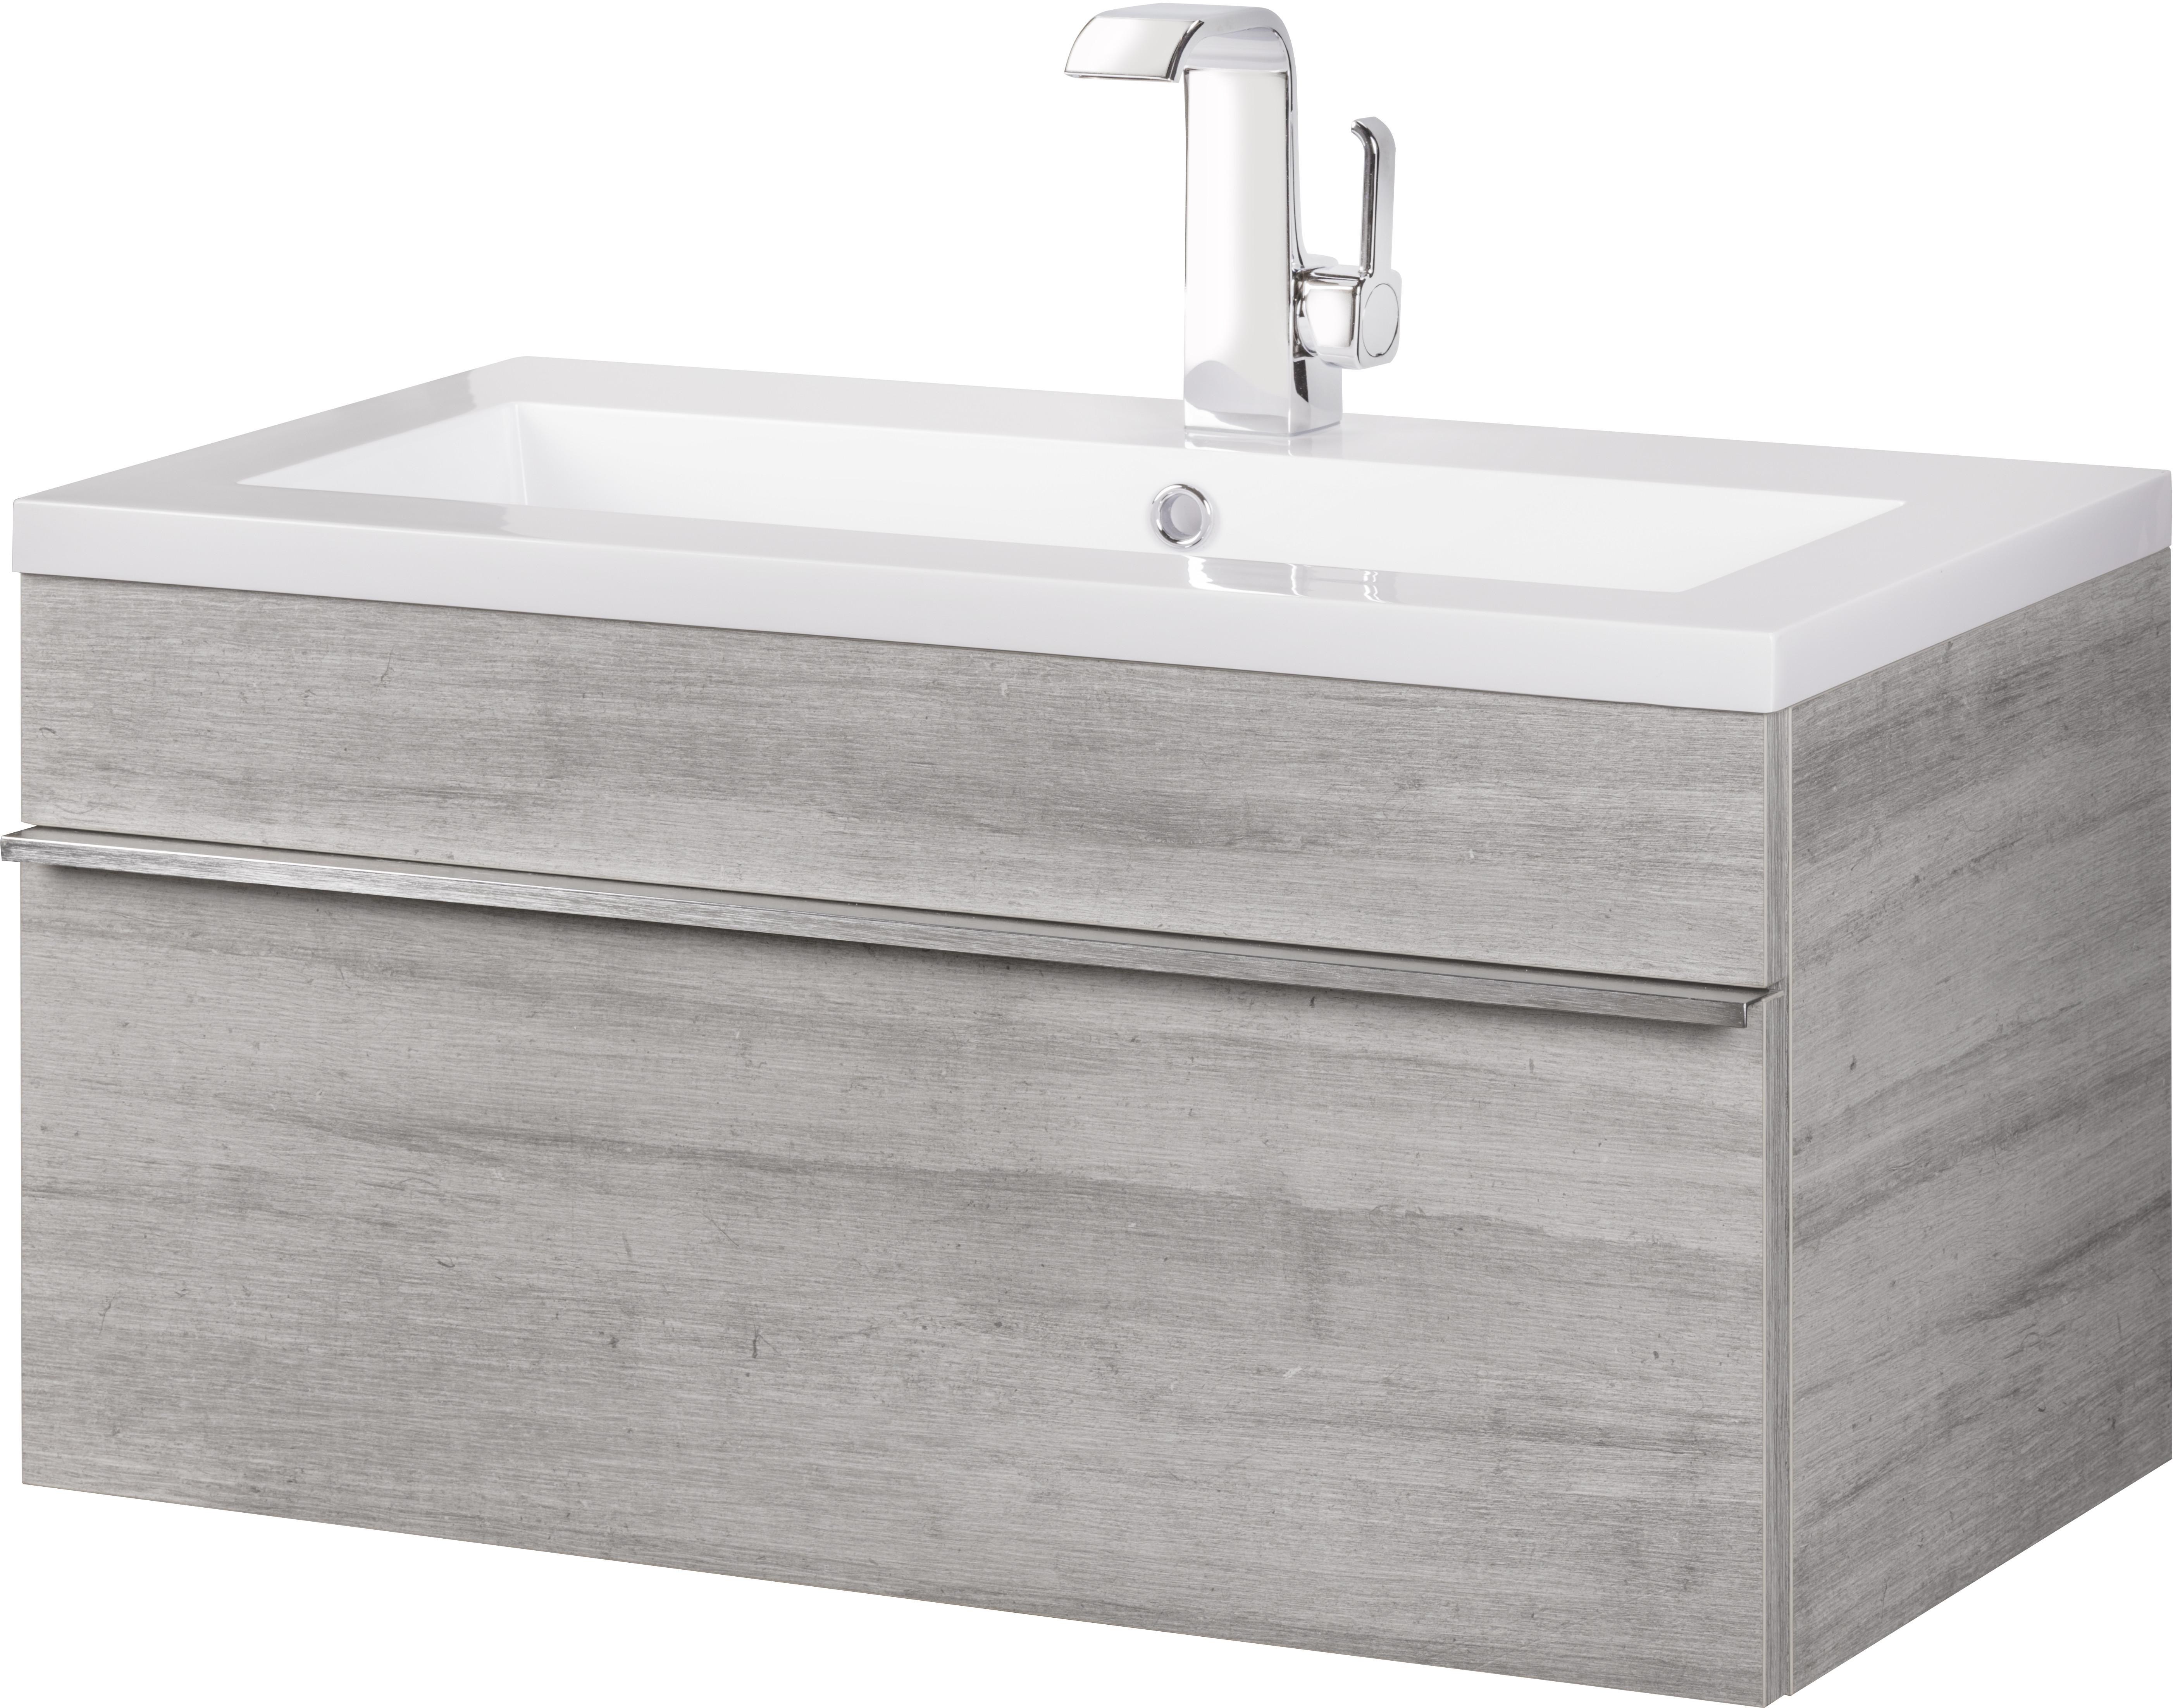 Cutler Kitchen Bath Trough Fvtrsoho30